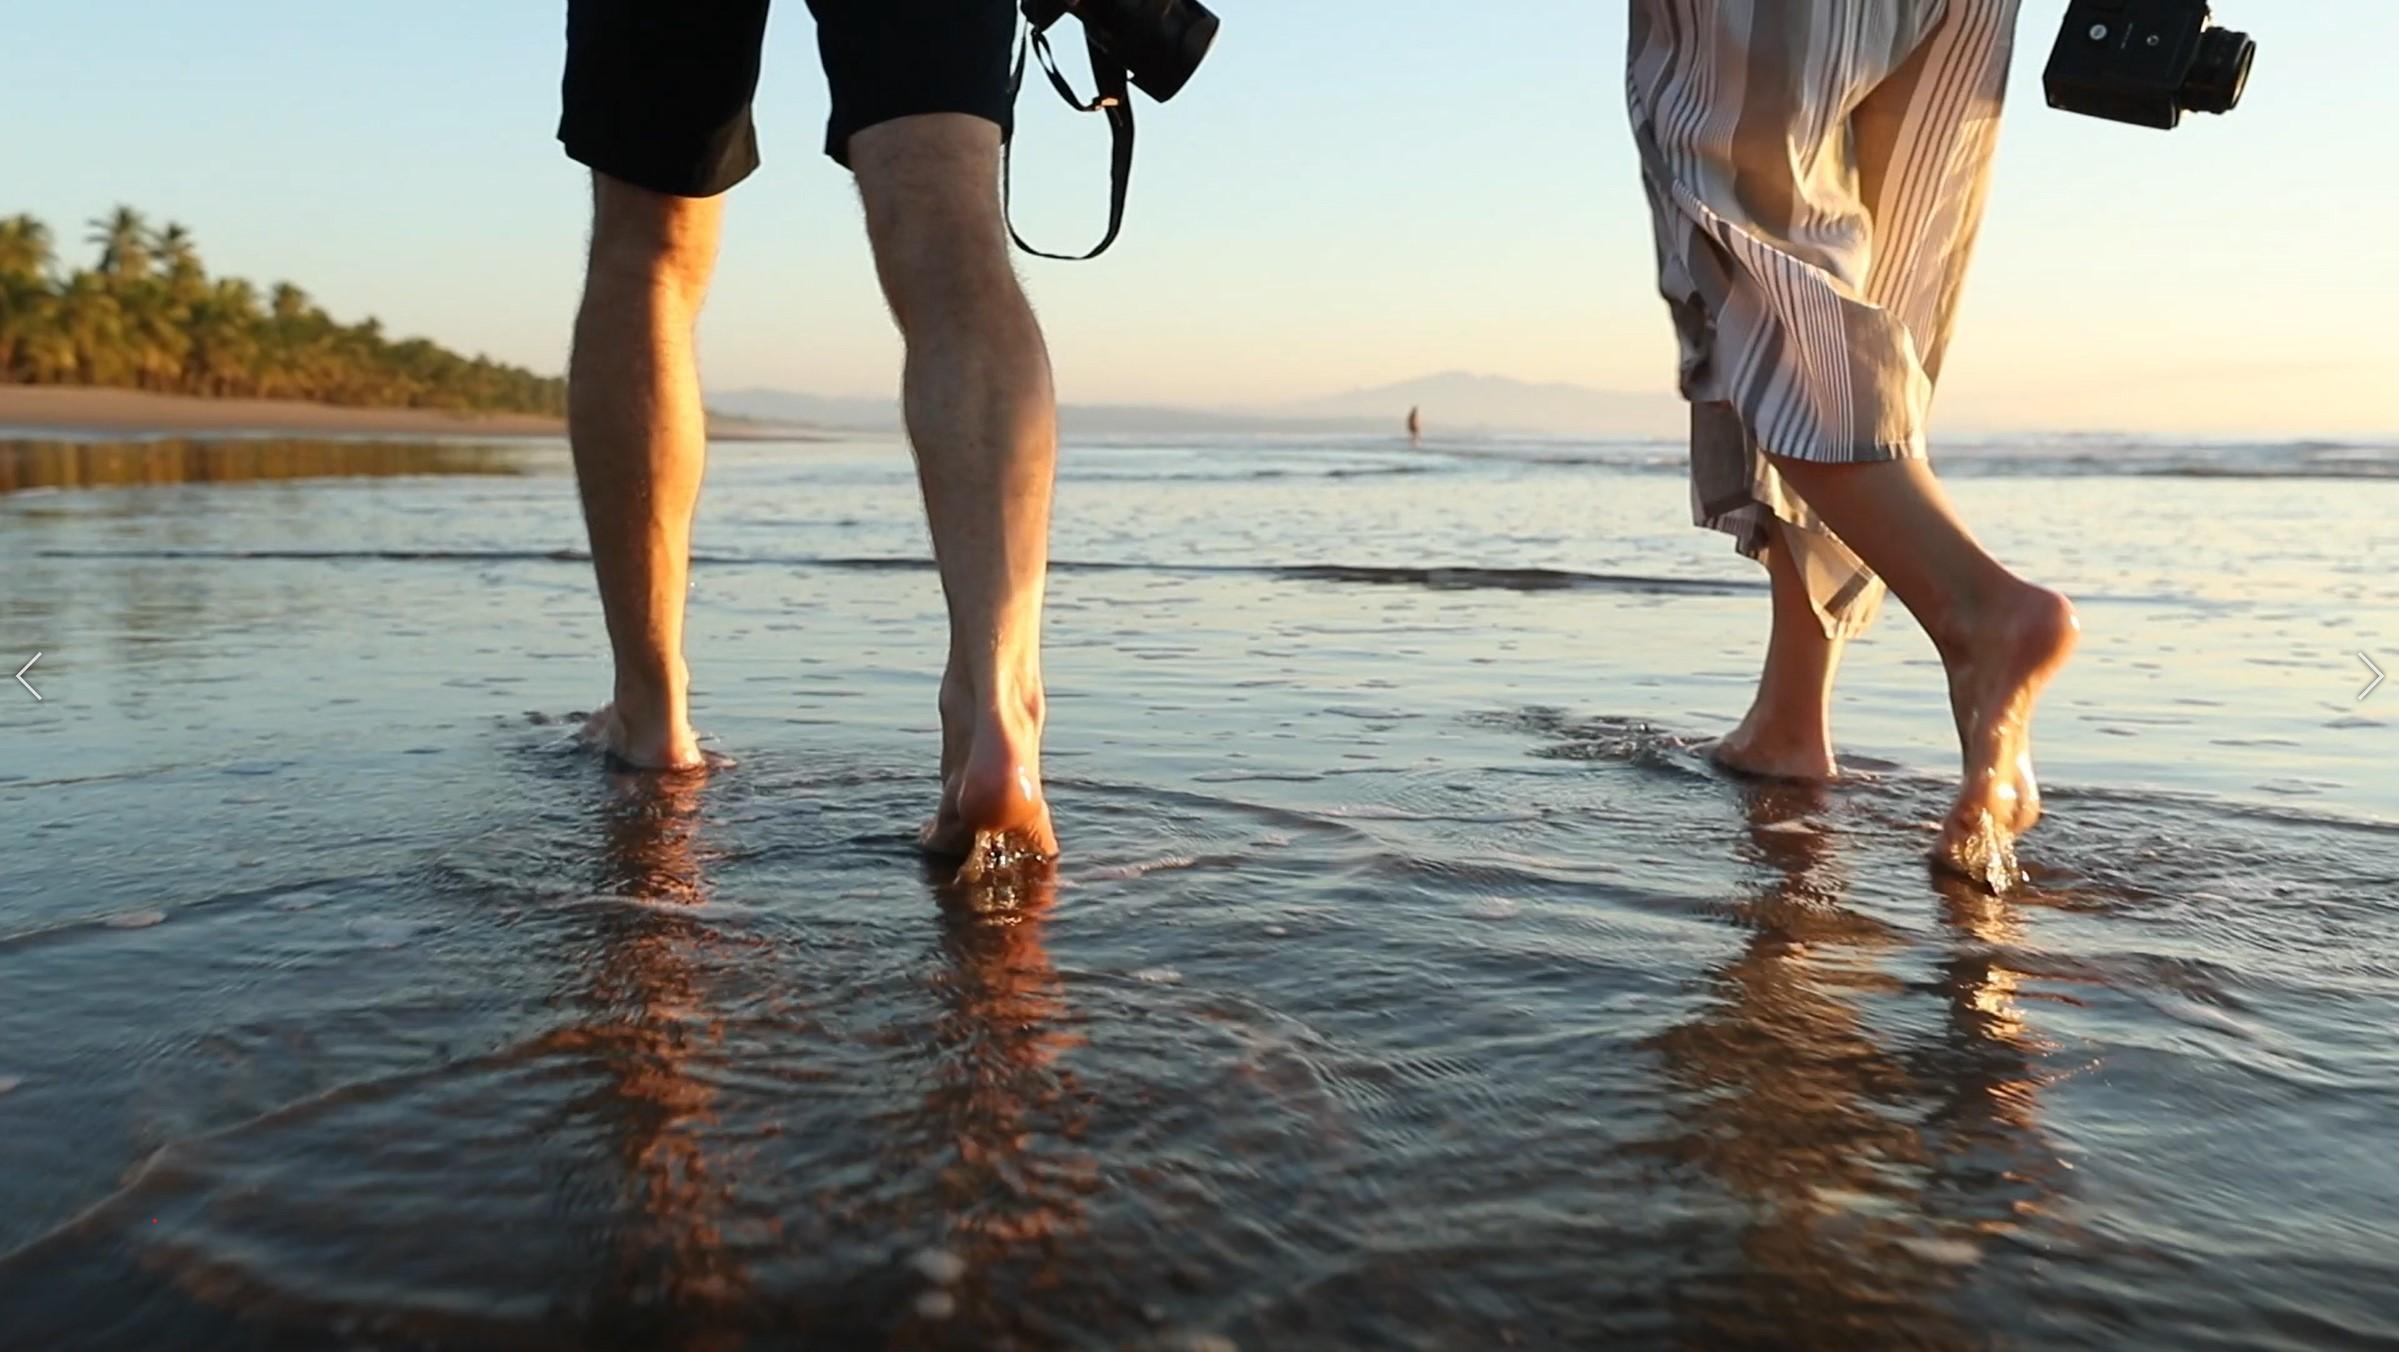 Playa Las Tortugas - Your Dream Mexican Getaway